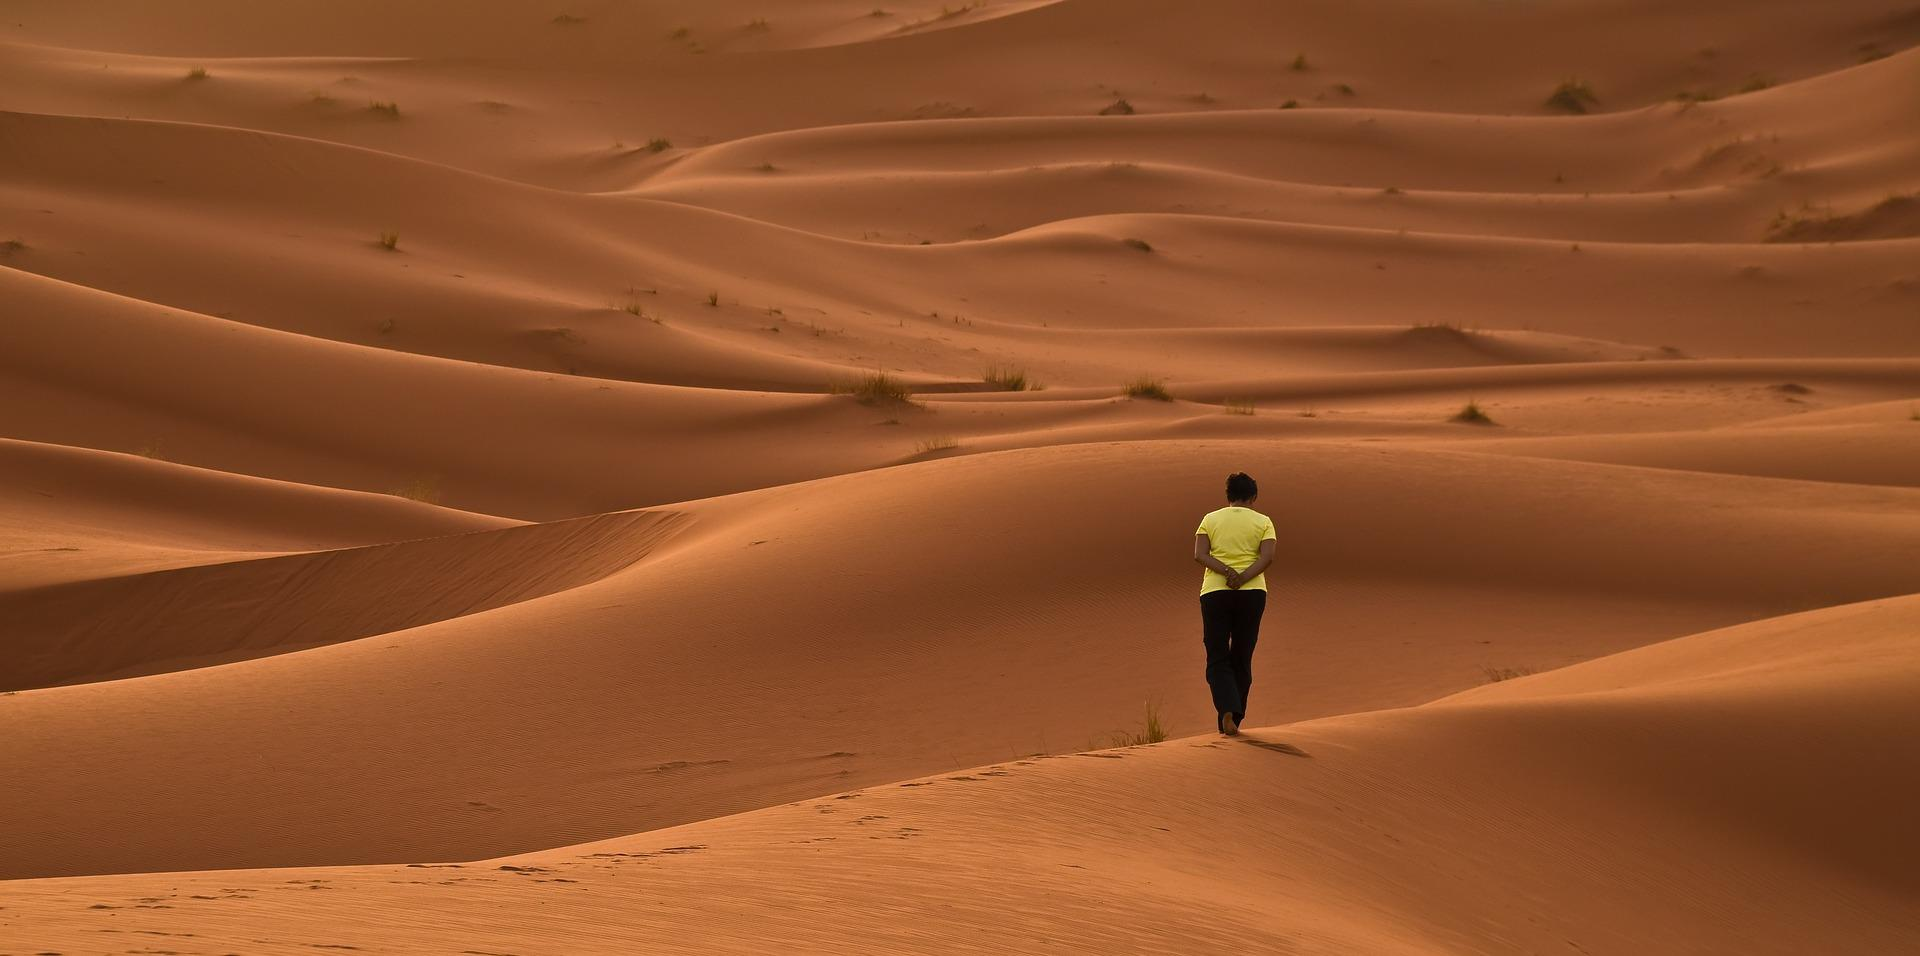 Excursión al desierto de Merzouga acabando en Fez